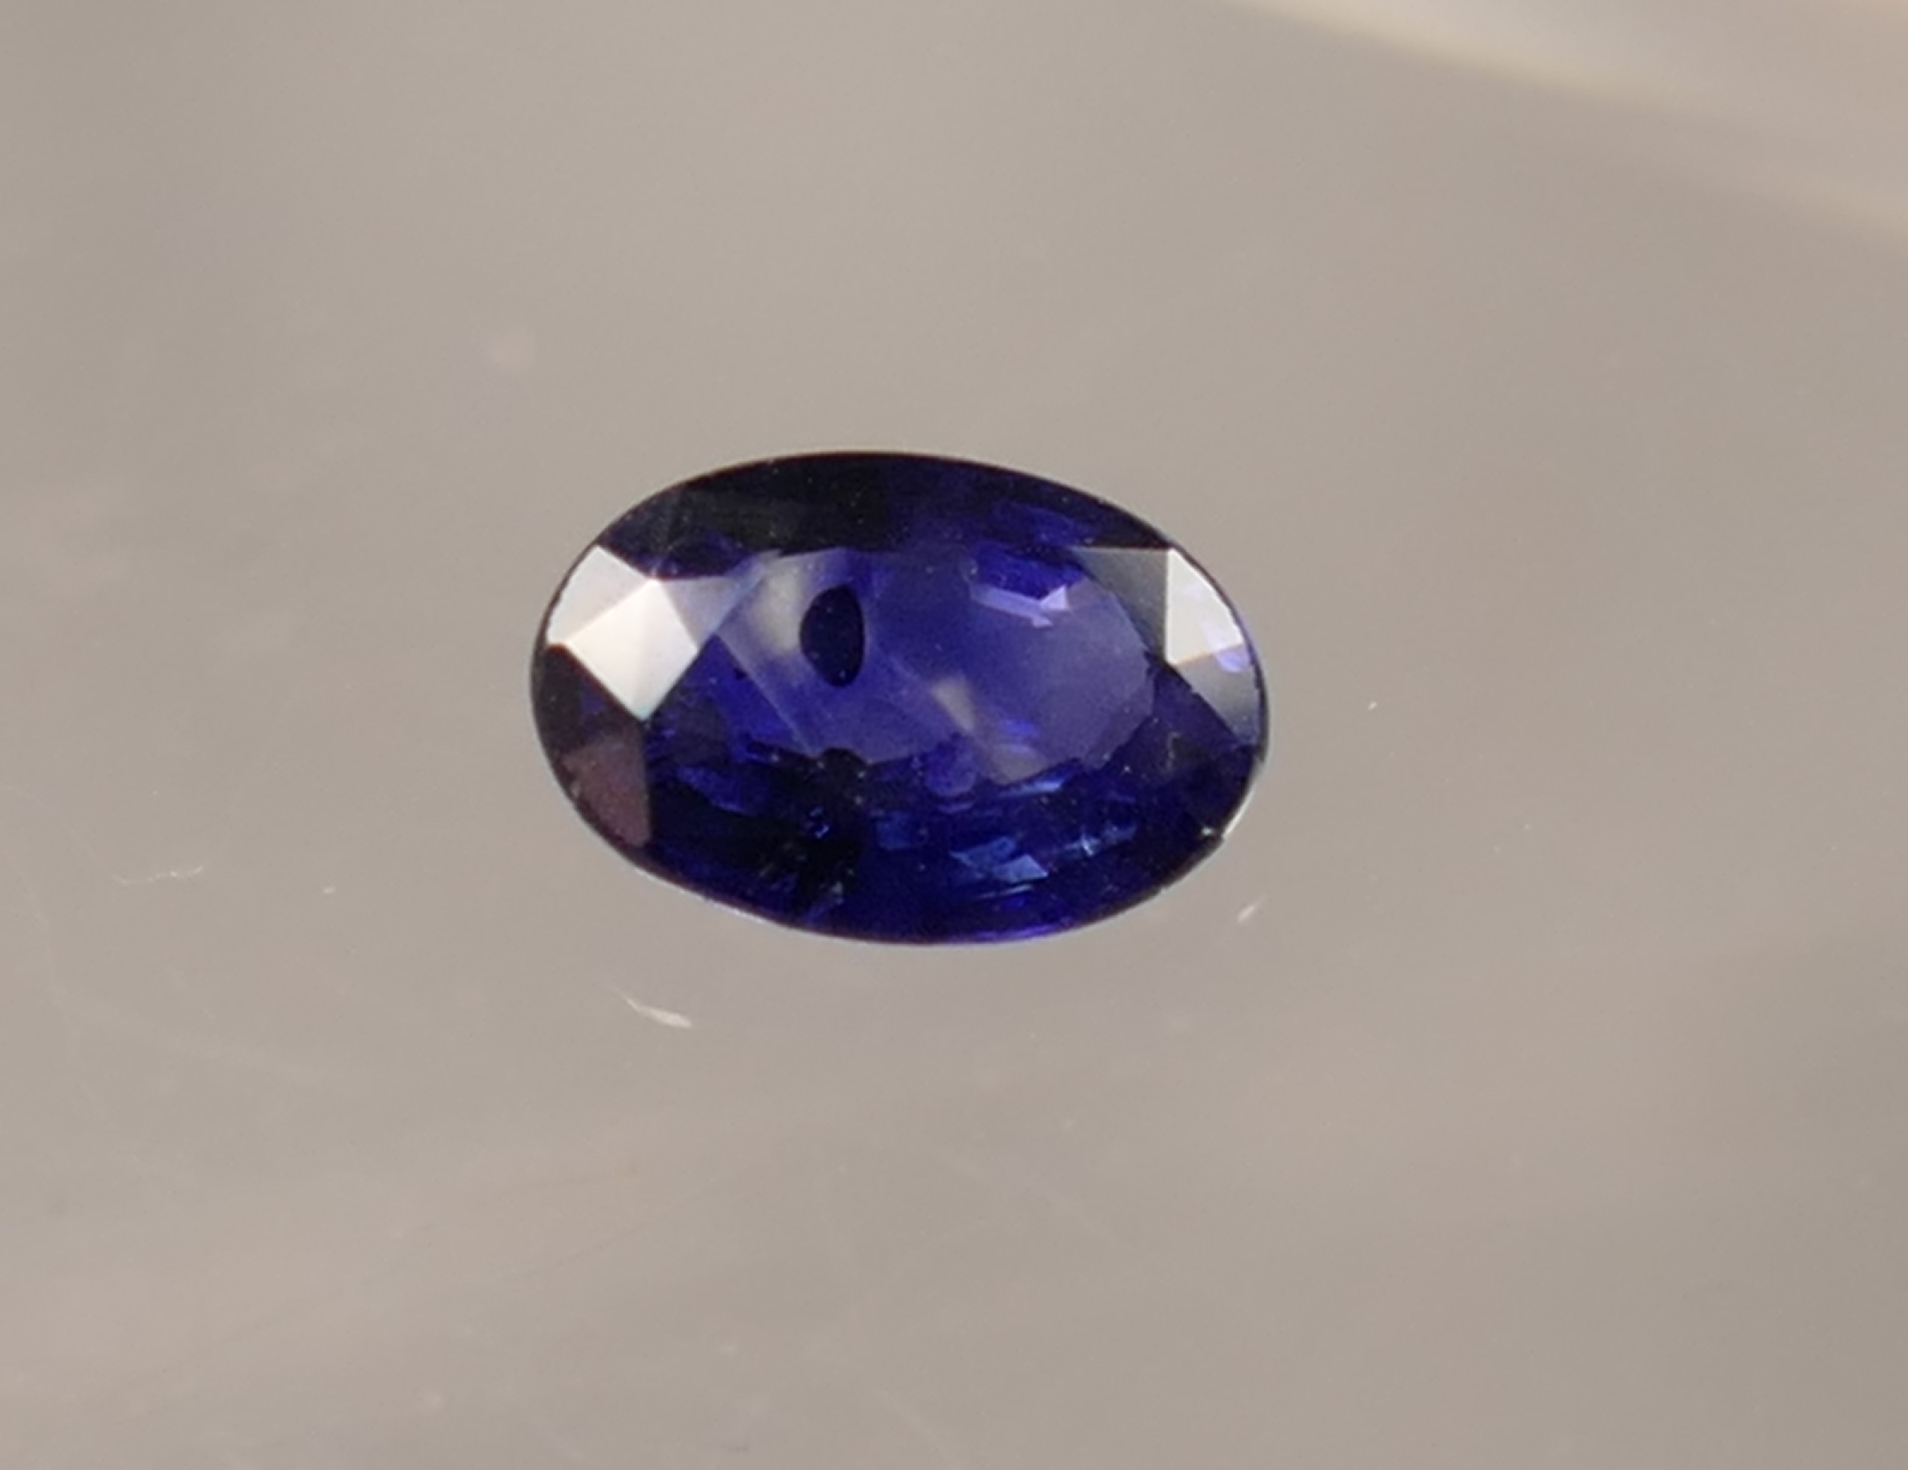 6x4mm Joli Saphir bleu roi naturel en facettée ovale Ceylan Sri Lanka 0.45ct (#PB276)